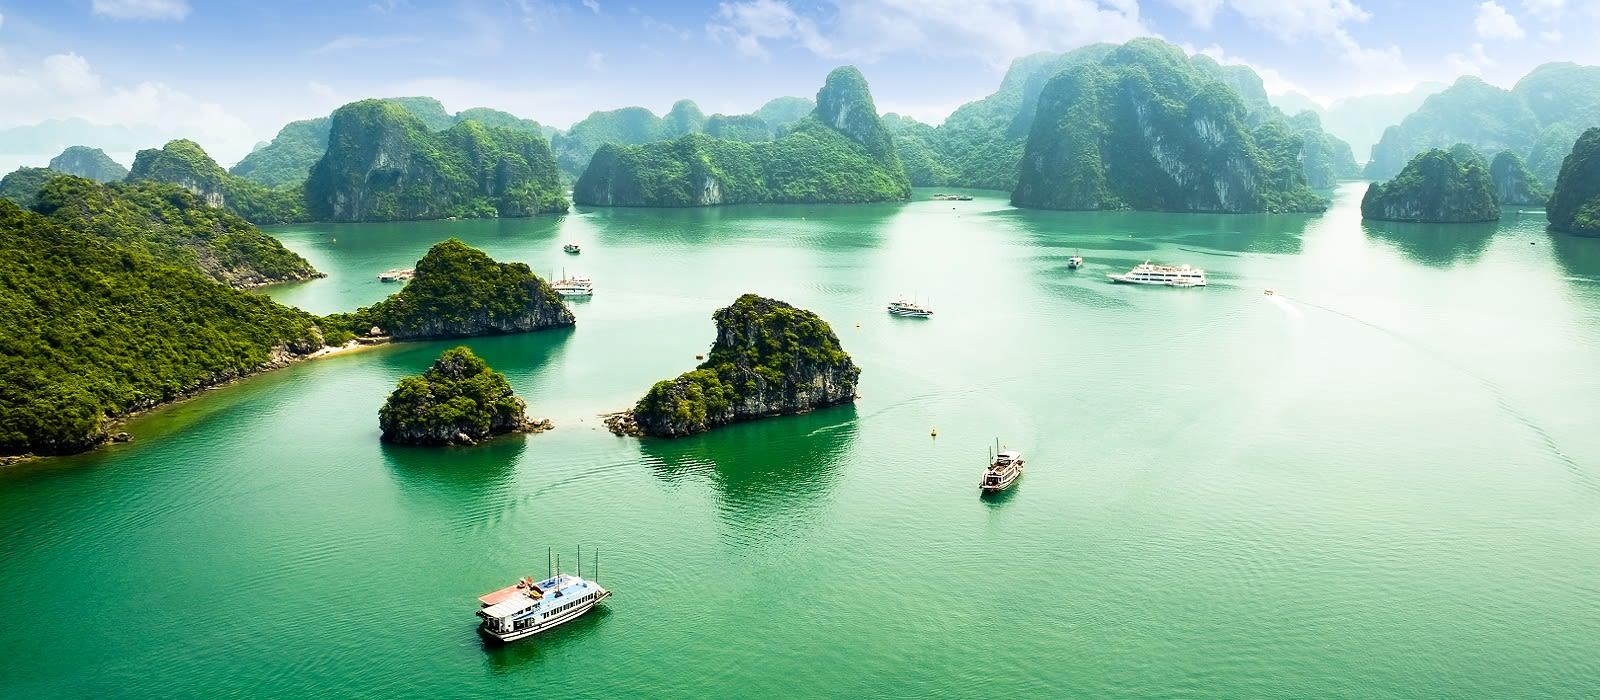 Vietnam Hautnah: Von Hanoi nach Saigon Urlaub 3